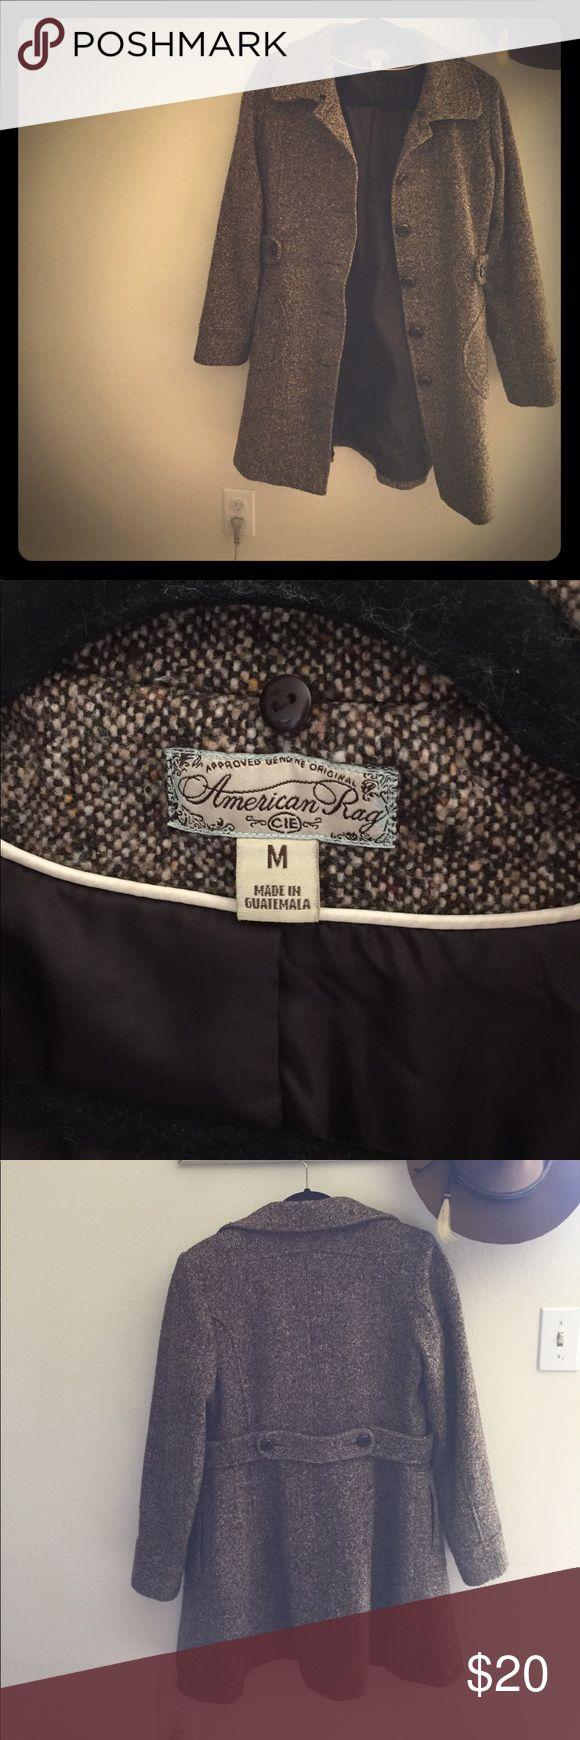 American Rag tweed coat American Rag tweed winter coat size M! Good condition. Just too big for me now. American Rag Jackets & Coats Pea Coats